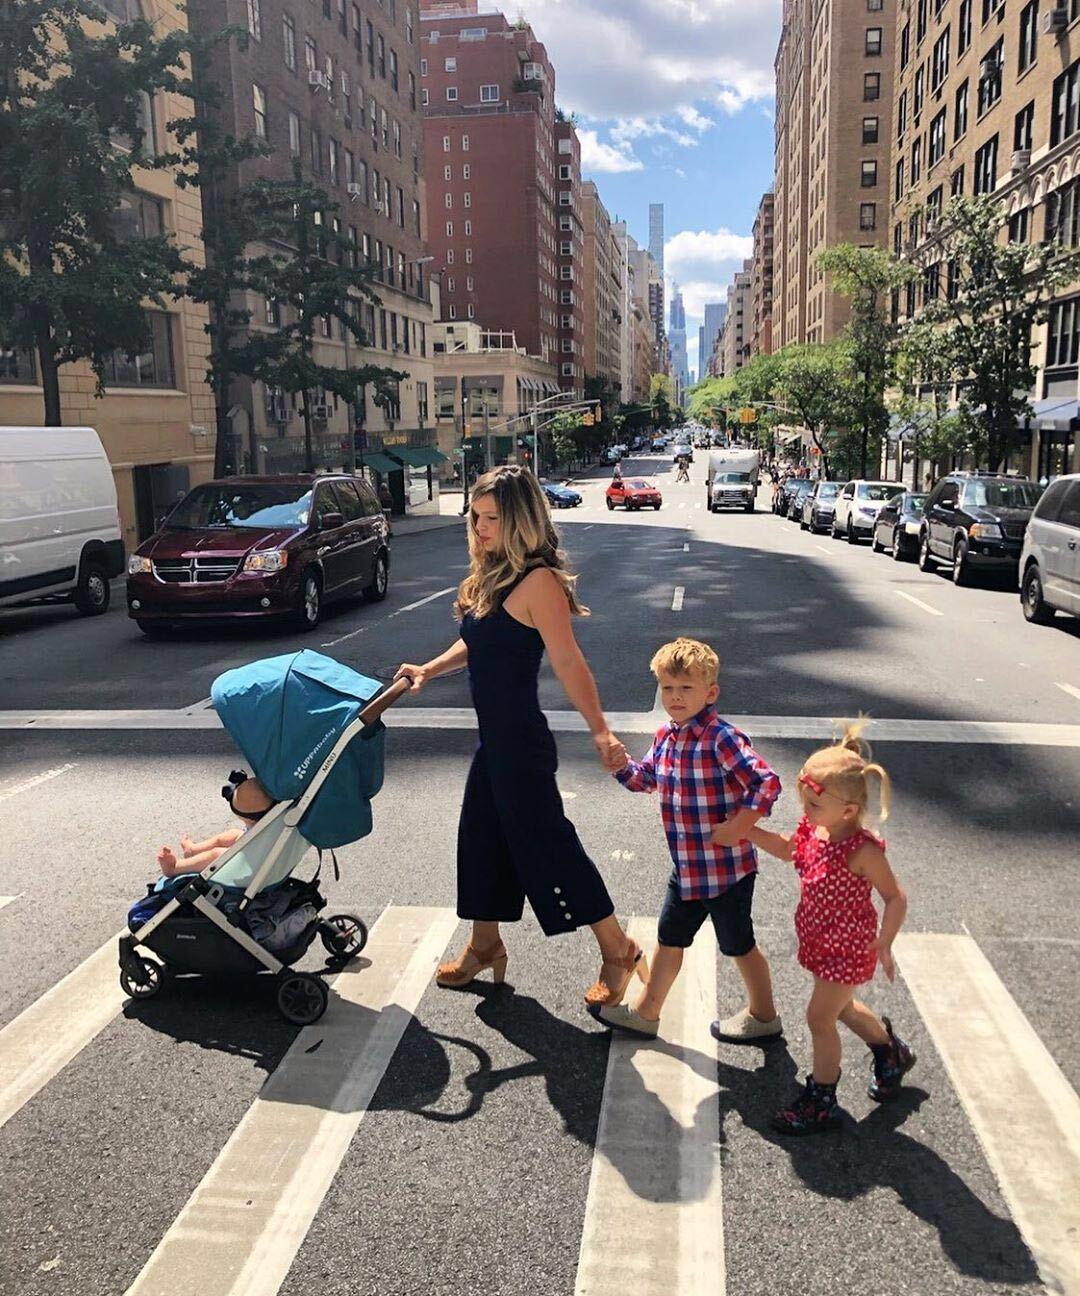 New York Family Fun - cover